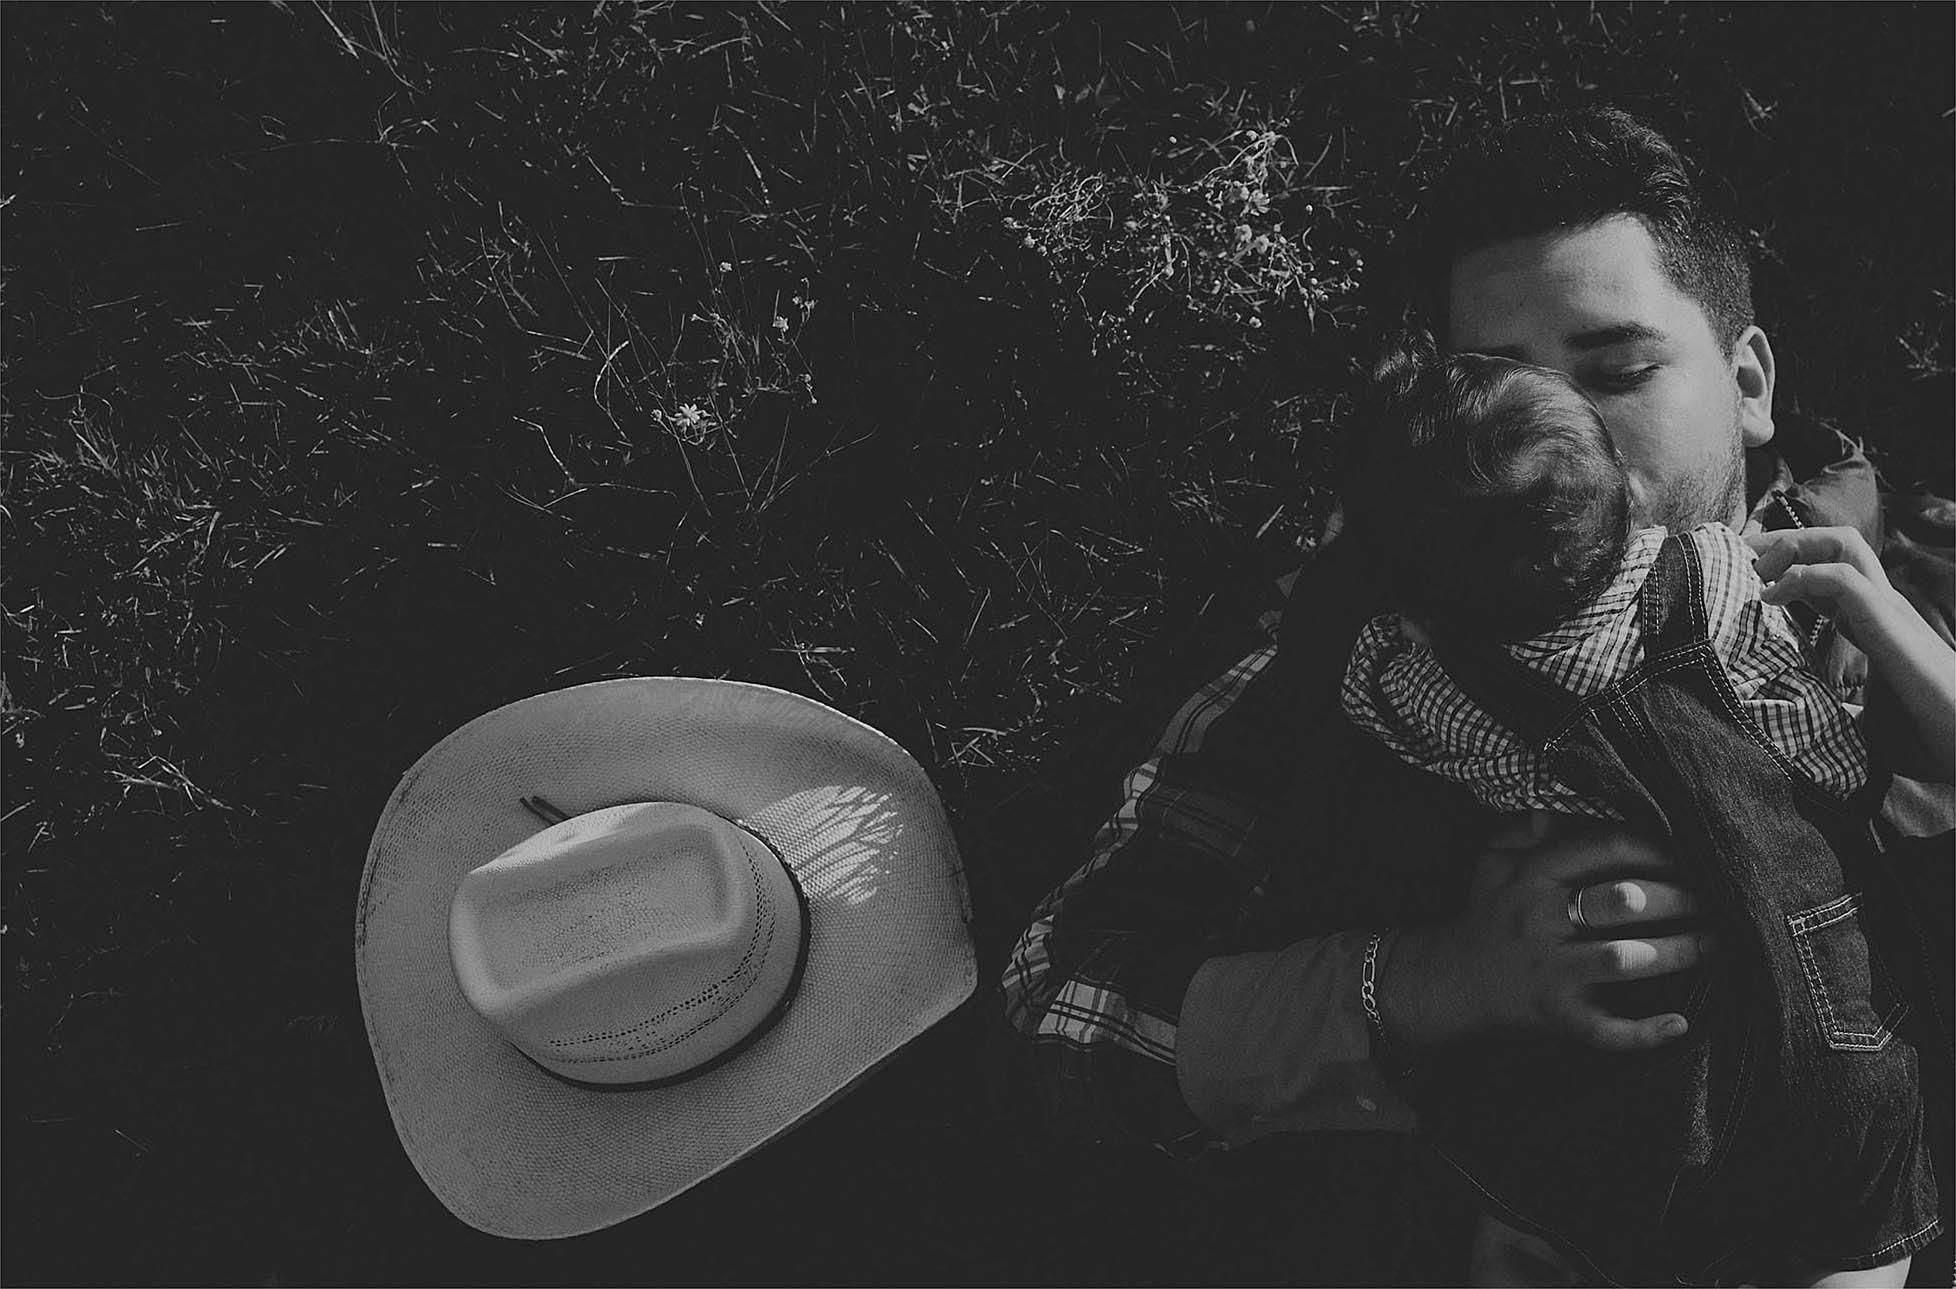 fotografo-de-familia-Queretaro-Román-2.jpg